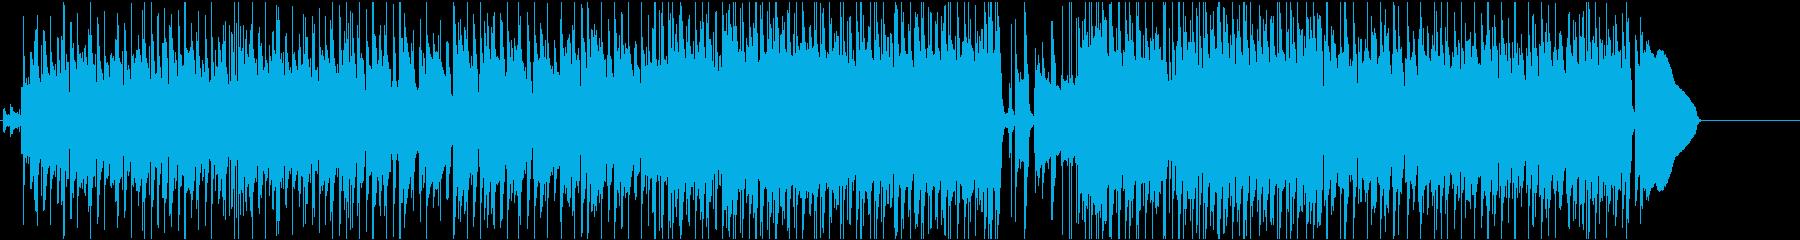 Lead BluesGuitarの再生済みの波形